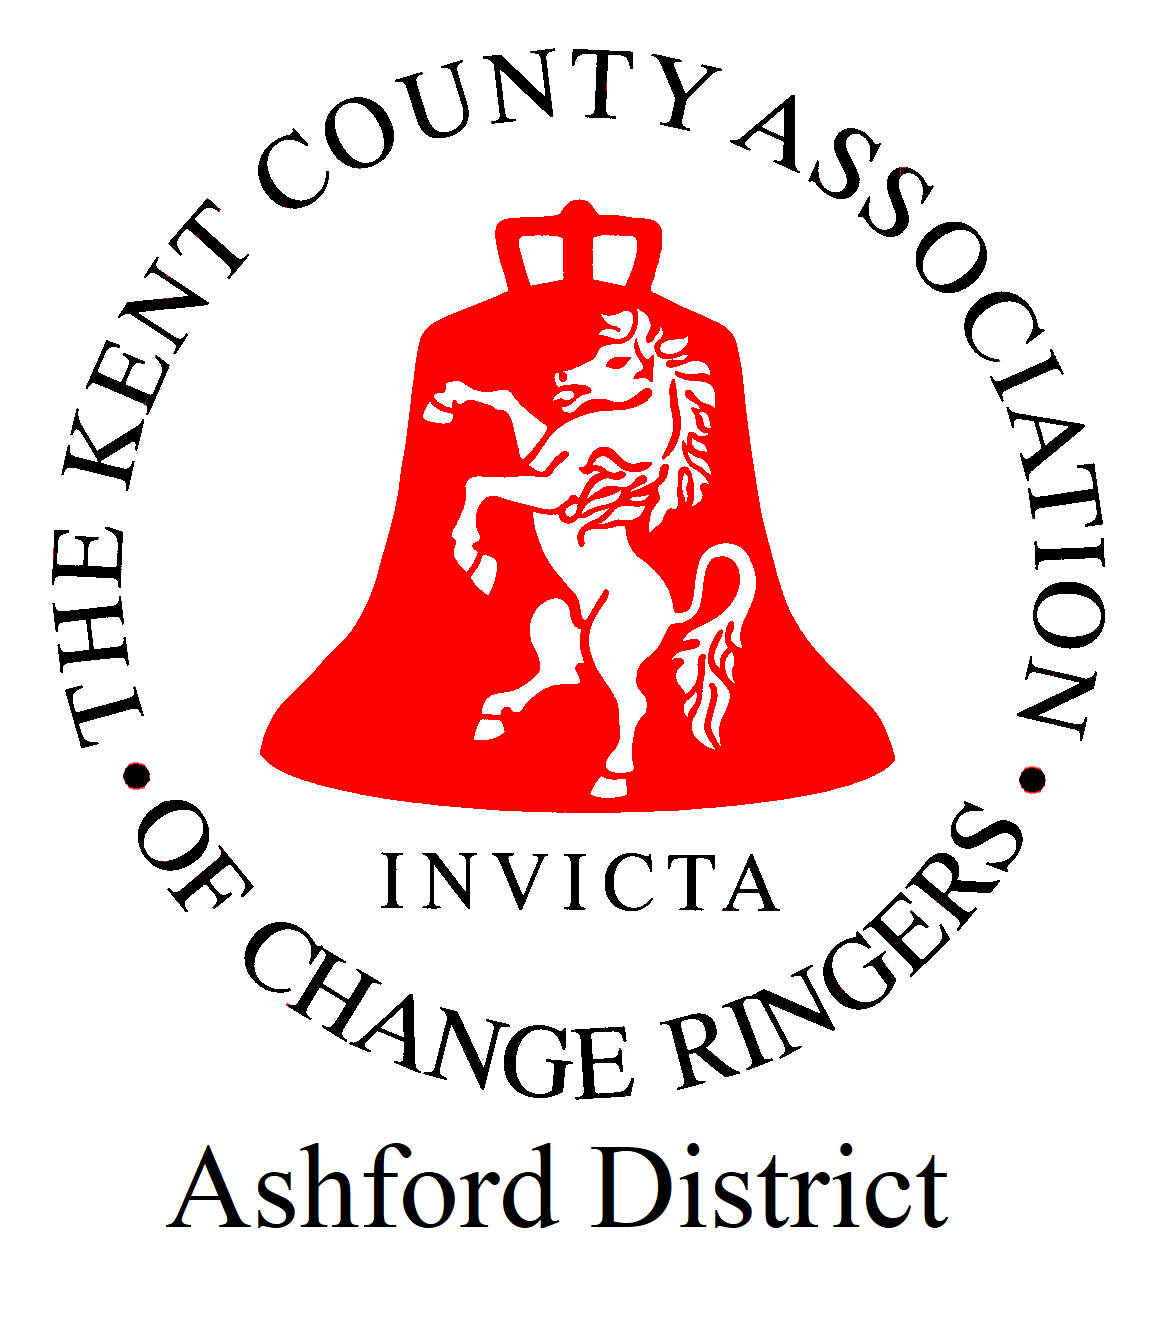 KCACOL_ashford_transparent